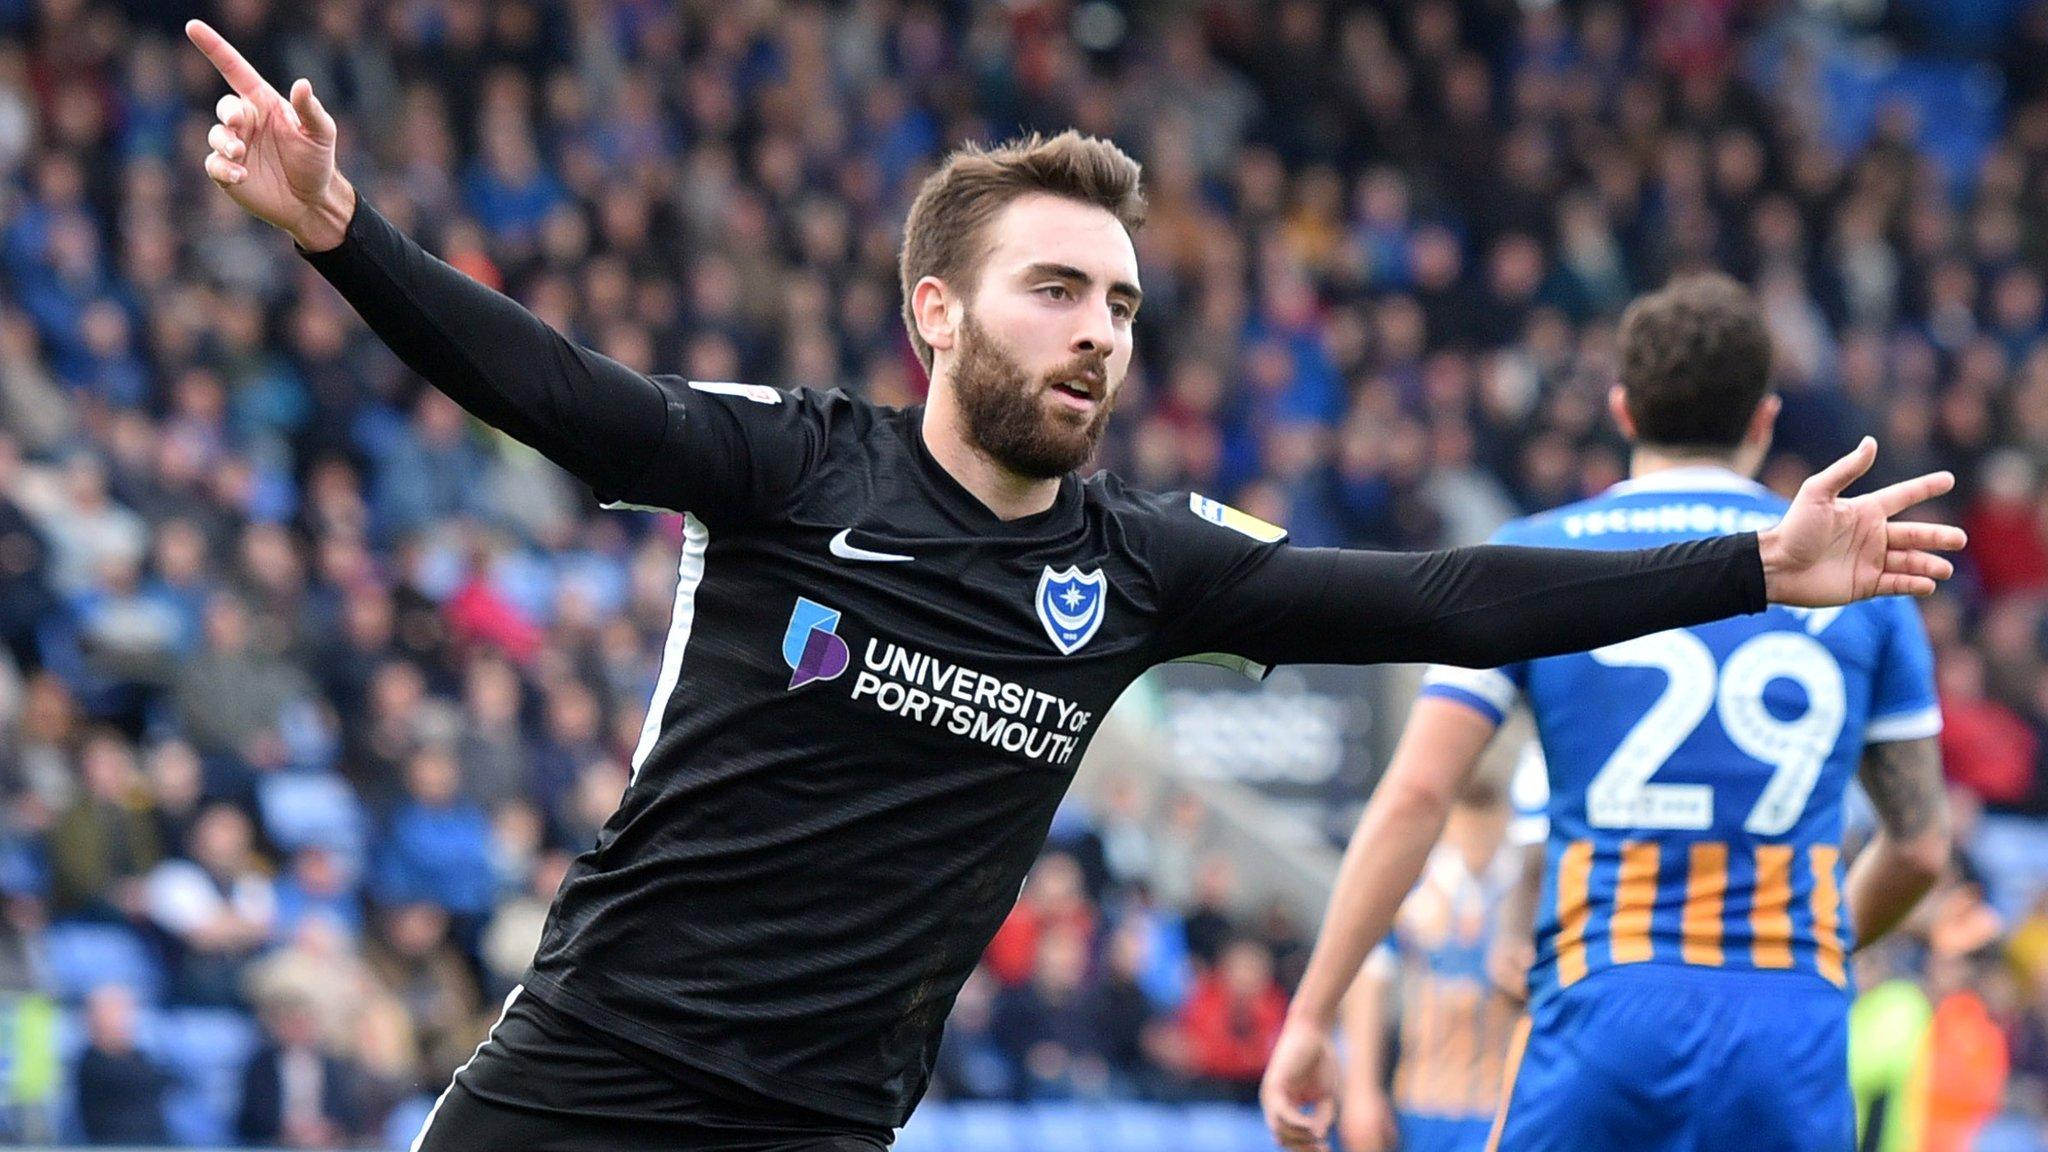 Shrewsbury Town 0-2 Portsmouth